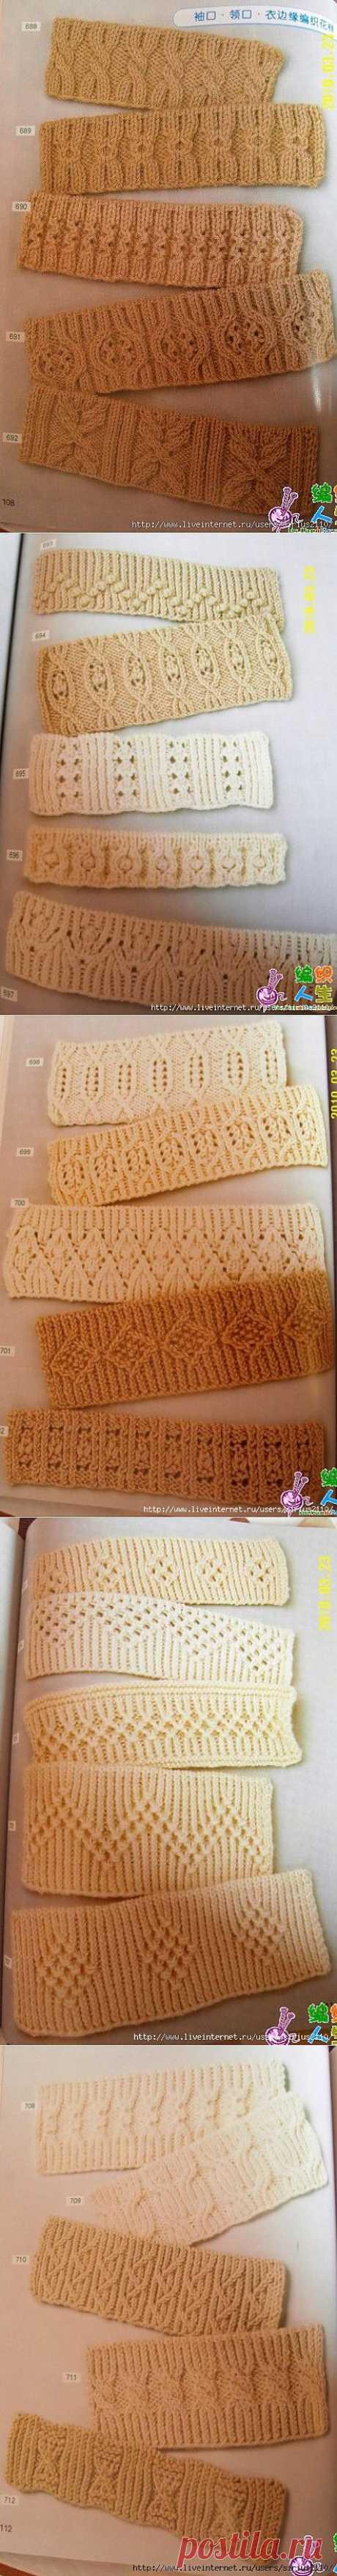 Вязание резинки спицами.